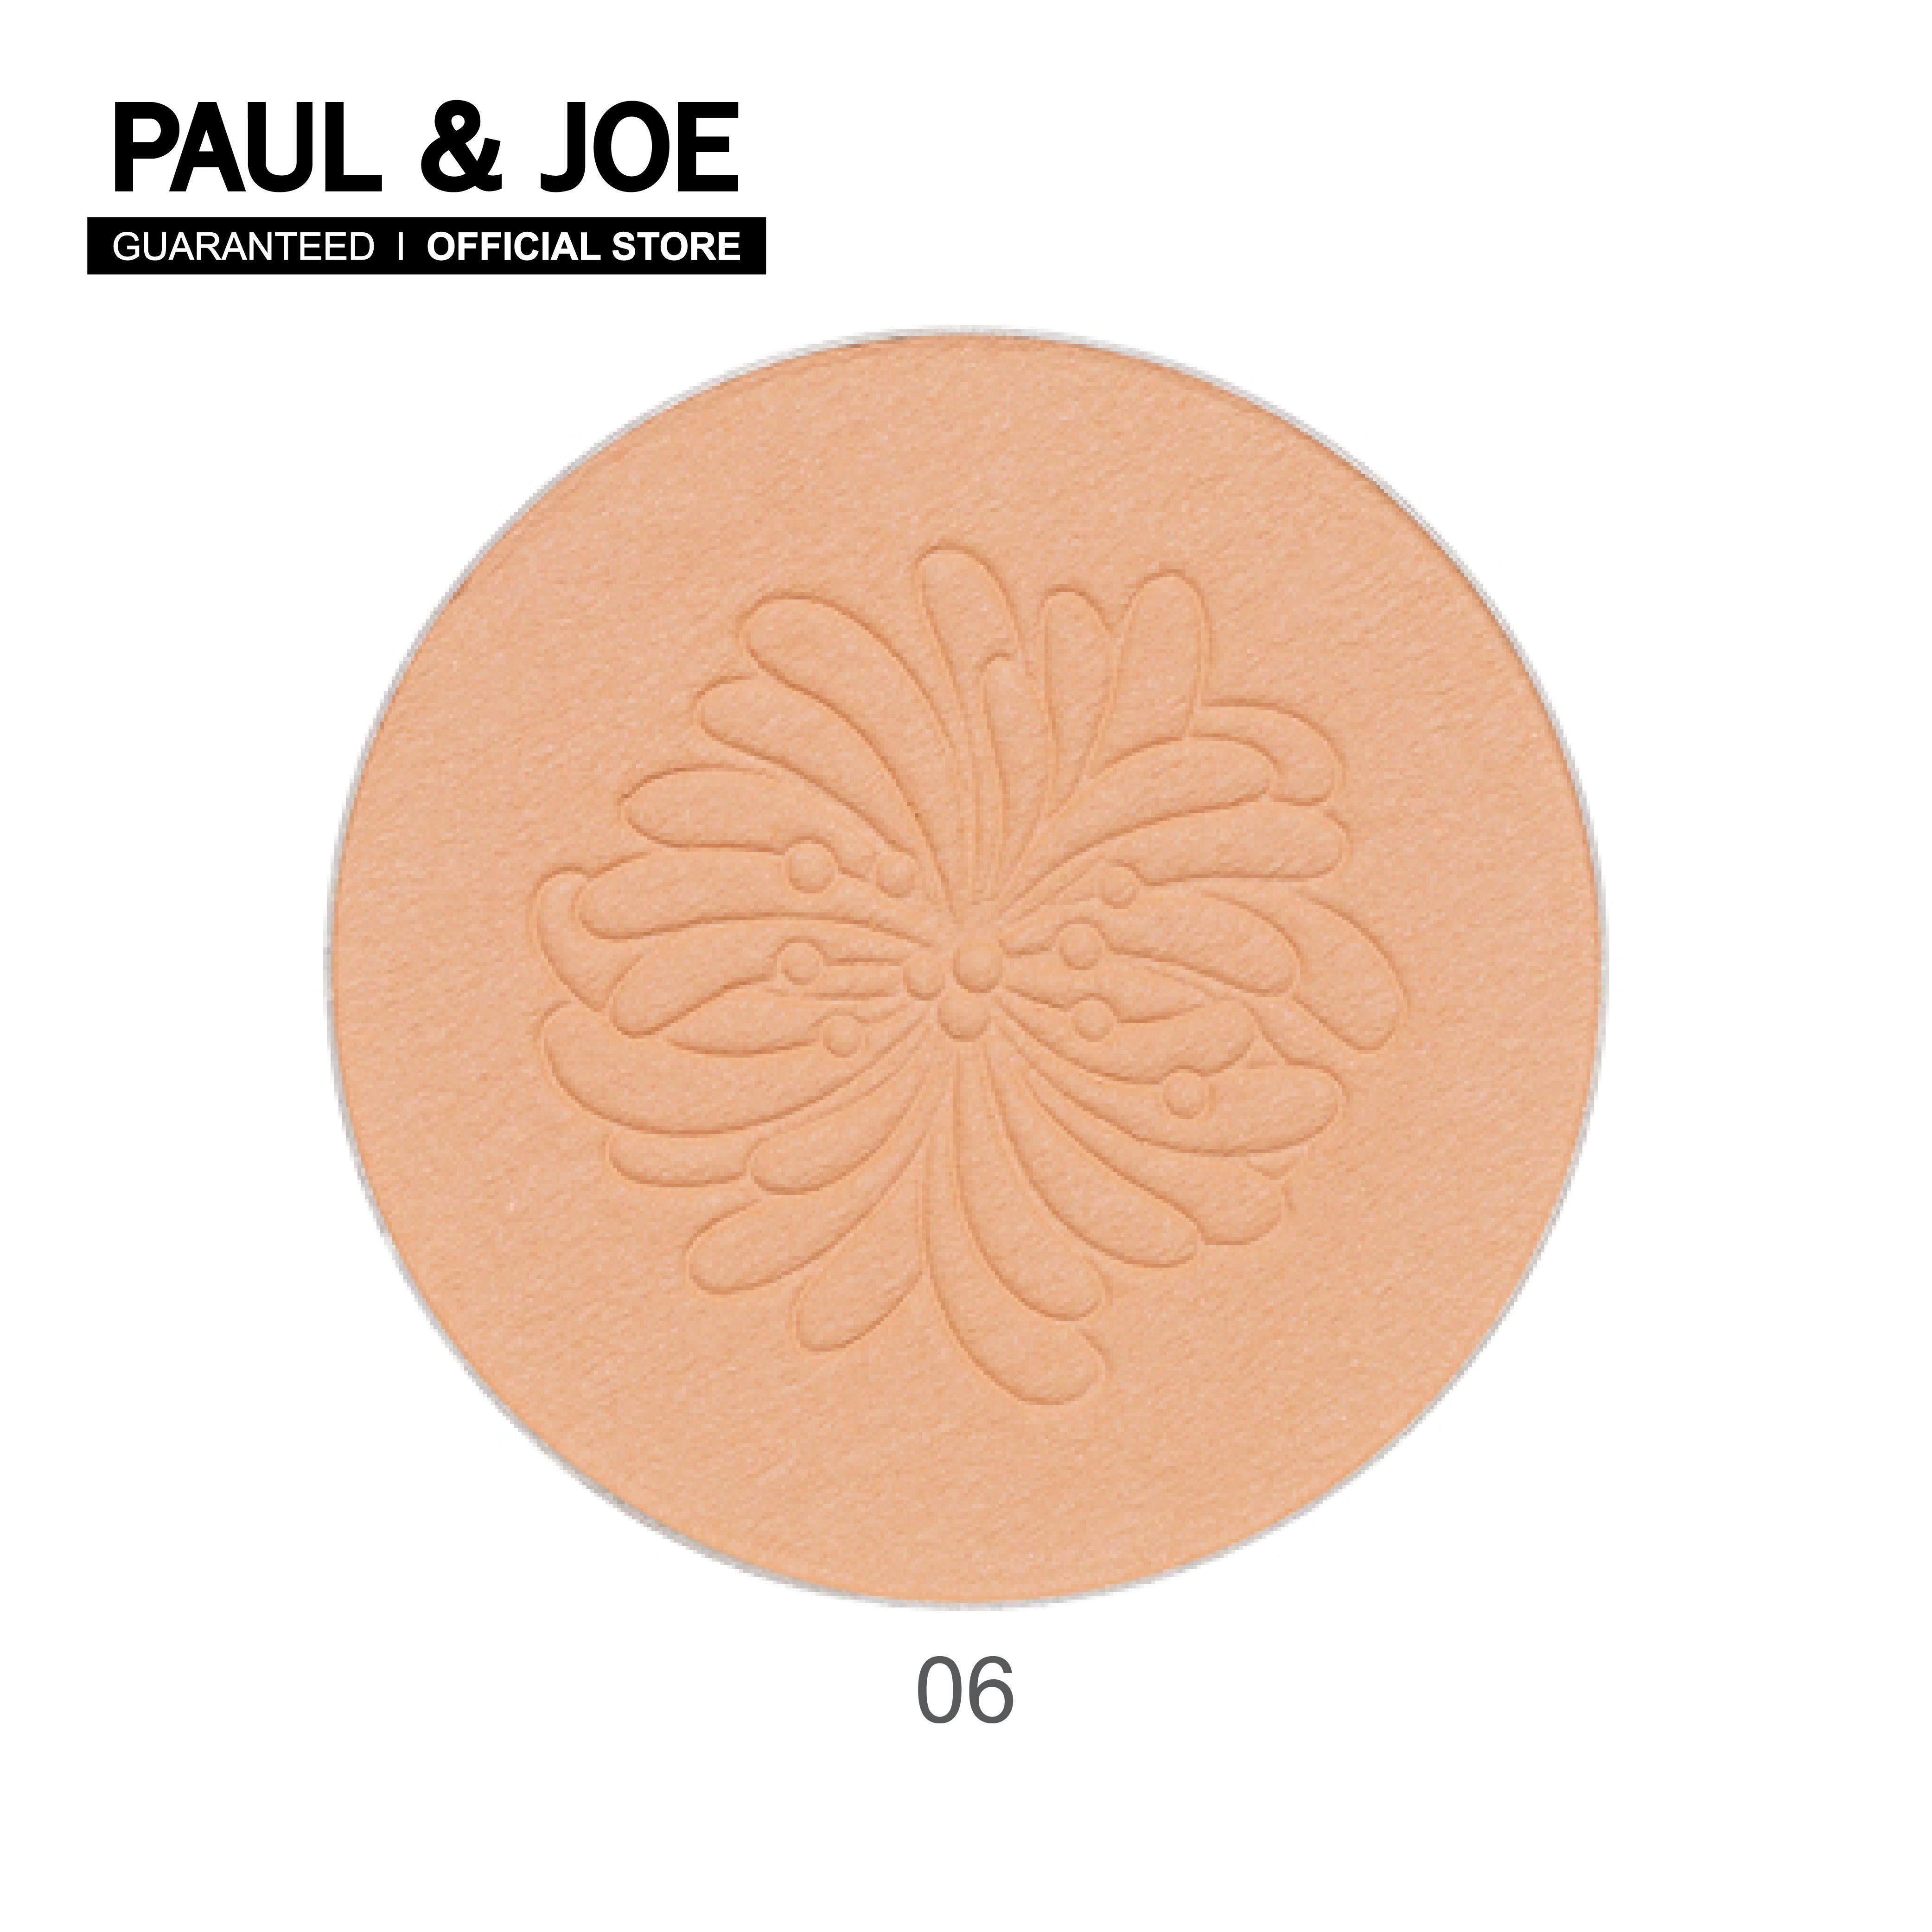 Paul & Joe Pressed Face Powder (refill) แป้งอัดแข็งโปร่งแสง เนื้อละเอียดมอบมิติให้ผิวสวยอย่างสมบูรณ์ ช่วยควบคุมความมันยาวนานตลอดวัน พร้อมทุกมุมมอง.